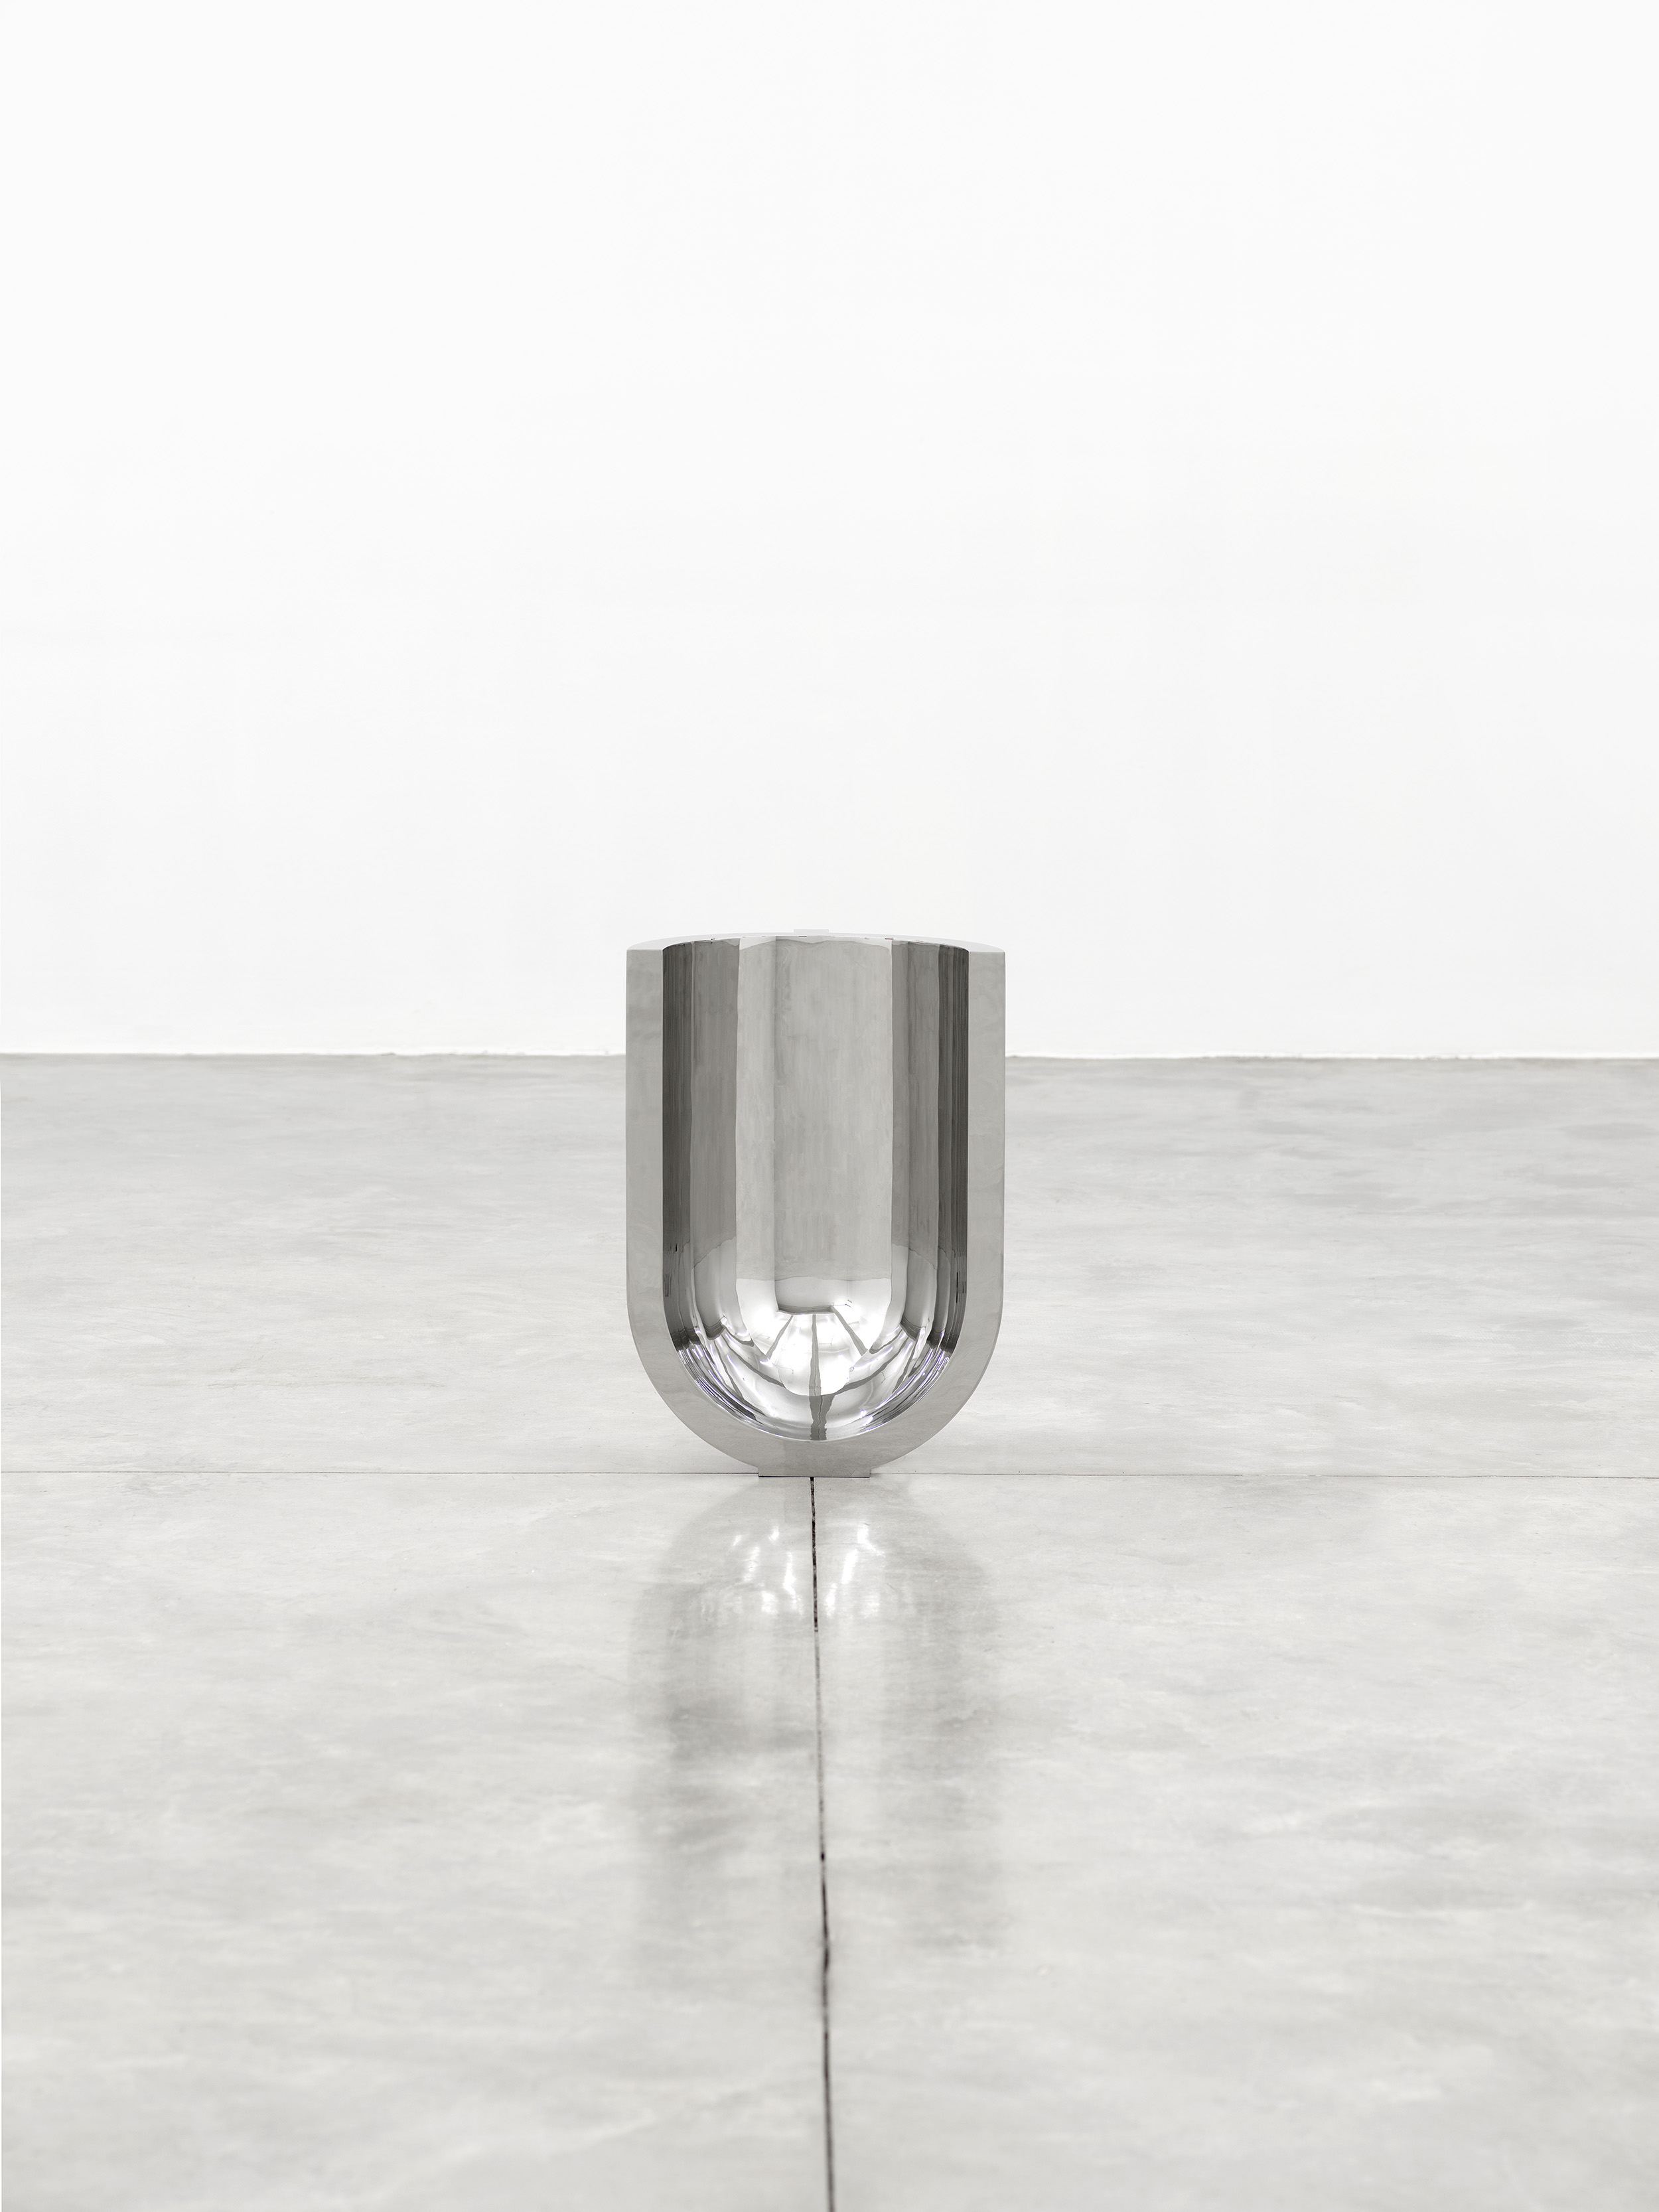 DavideBalliani at Tina Kim Gallery_0009_POST.jpg